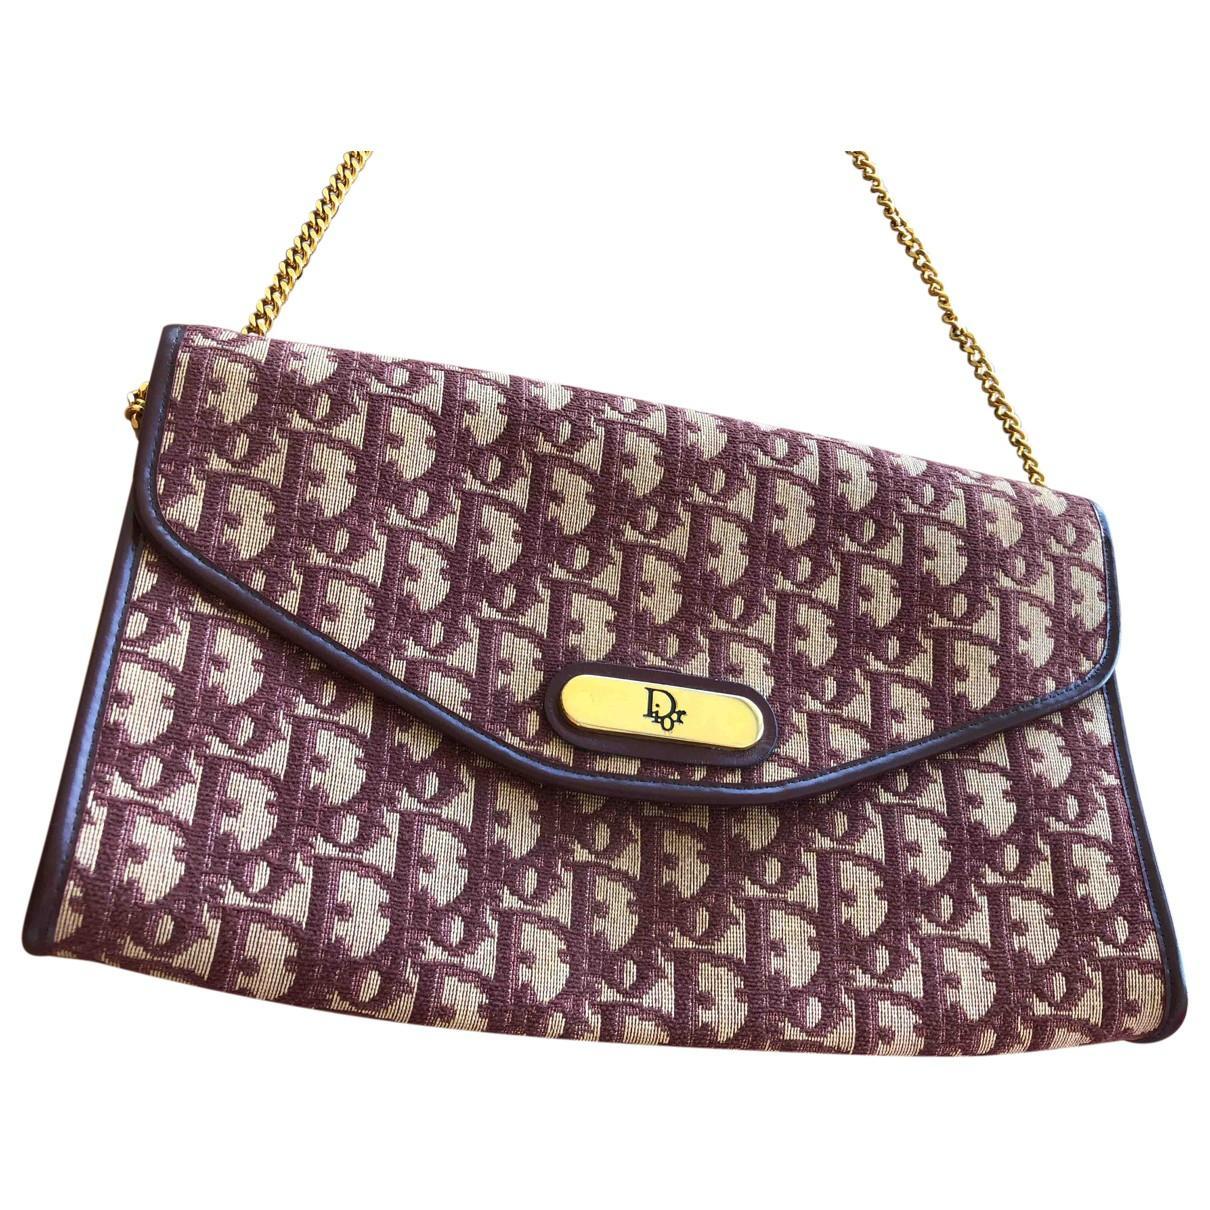 68890868fd15 Dior Pre-owned Cloth Clutch Bag in Purple - Lyst